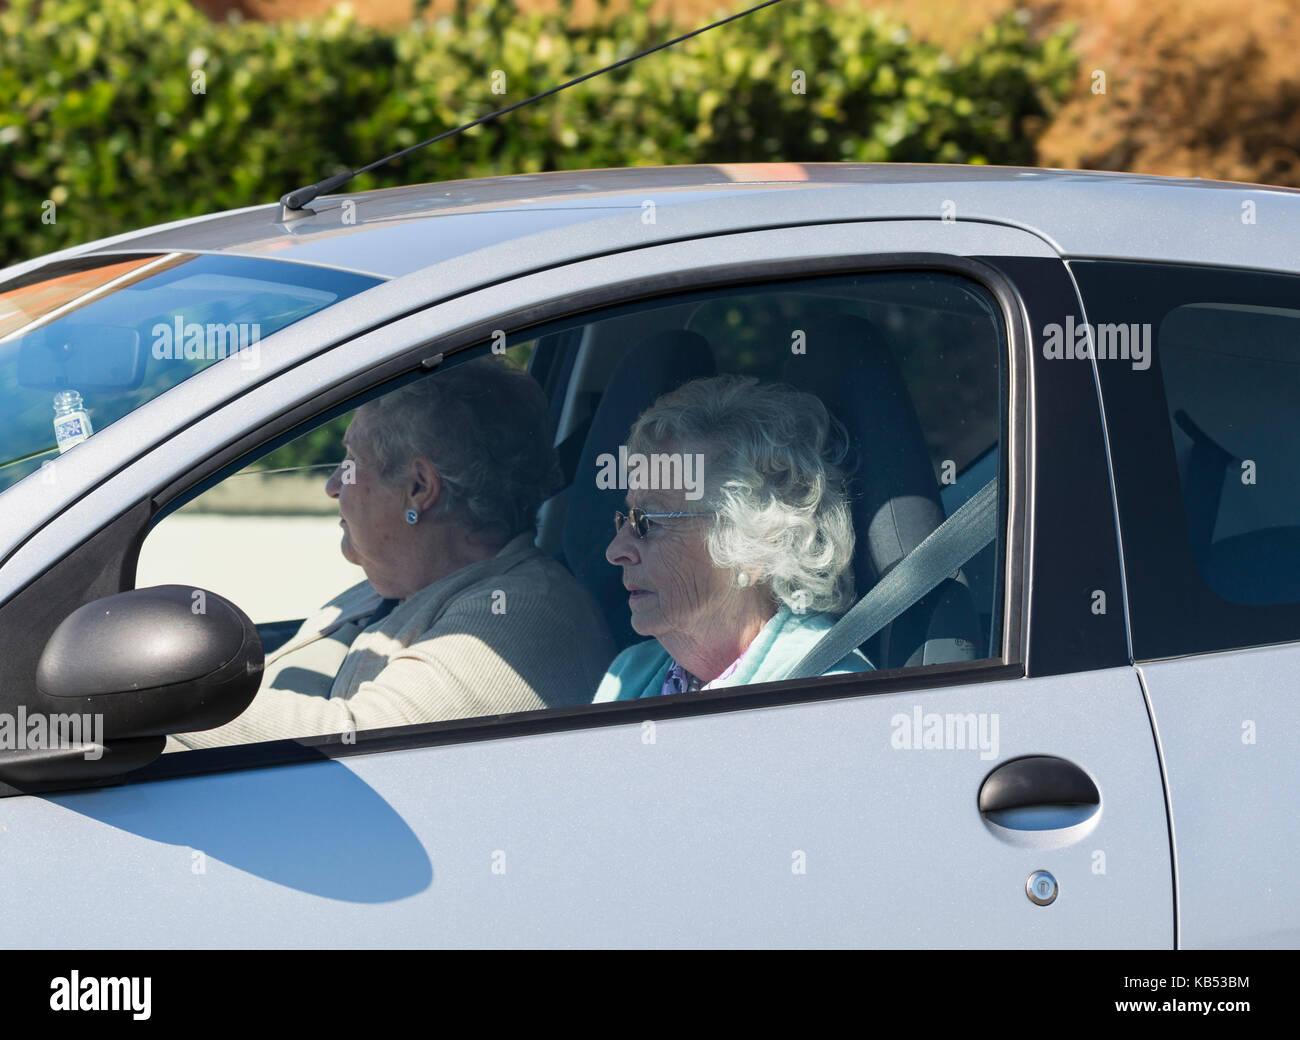 Pair of elderly women in a car. - Stock Image